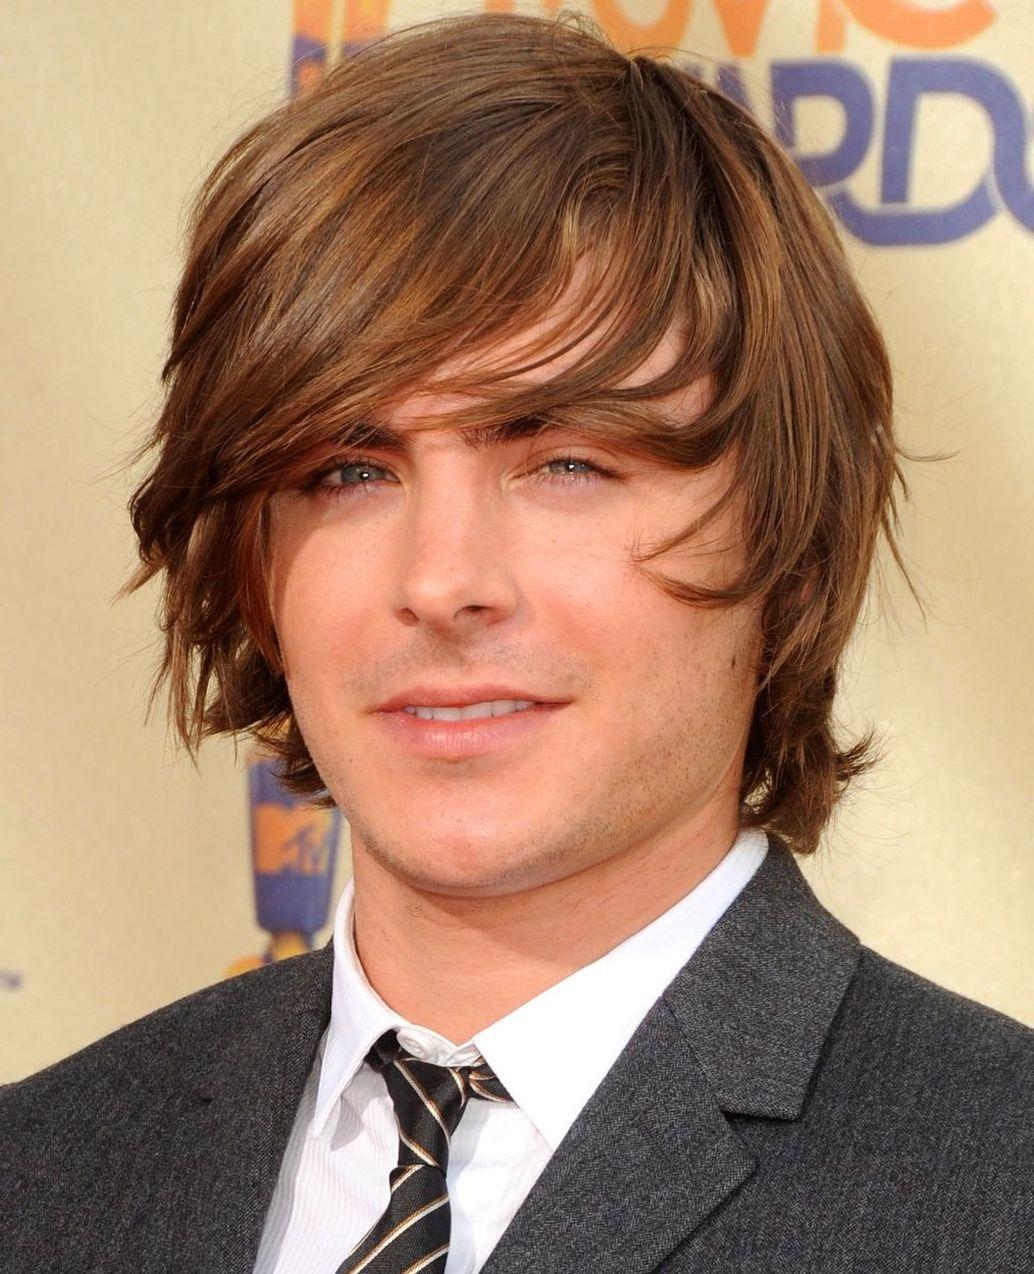 long hair style boys | fashion | pinterest | hair style boy and